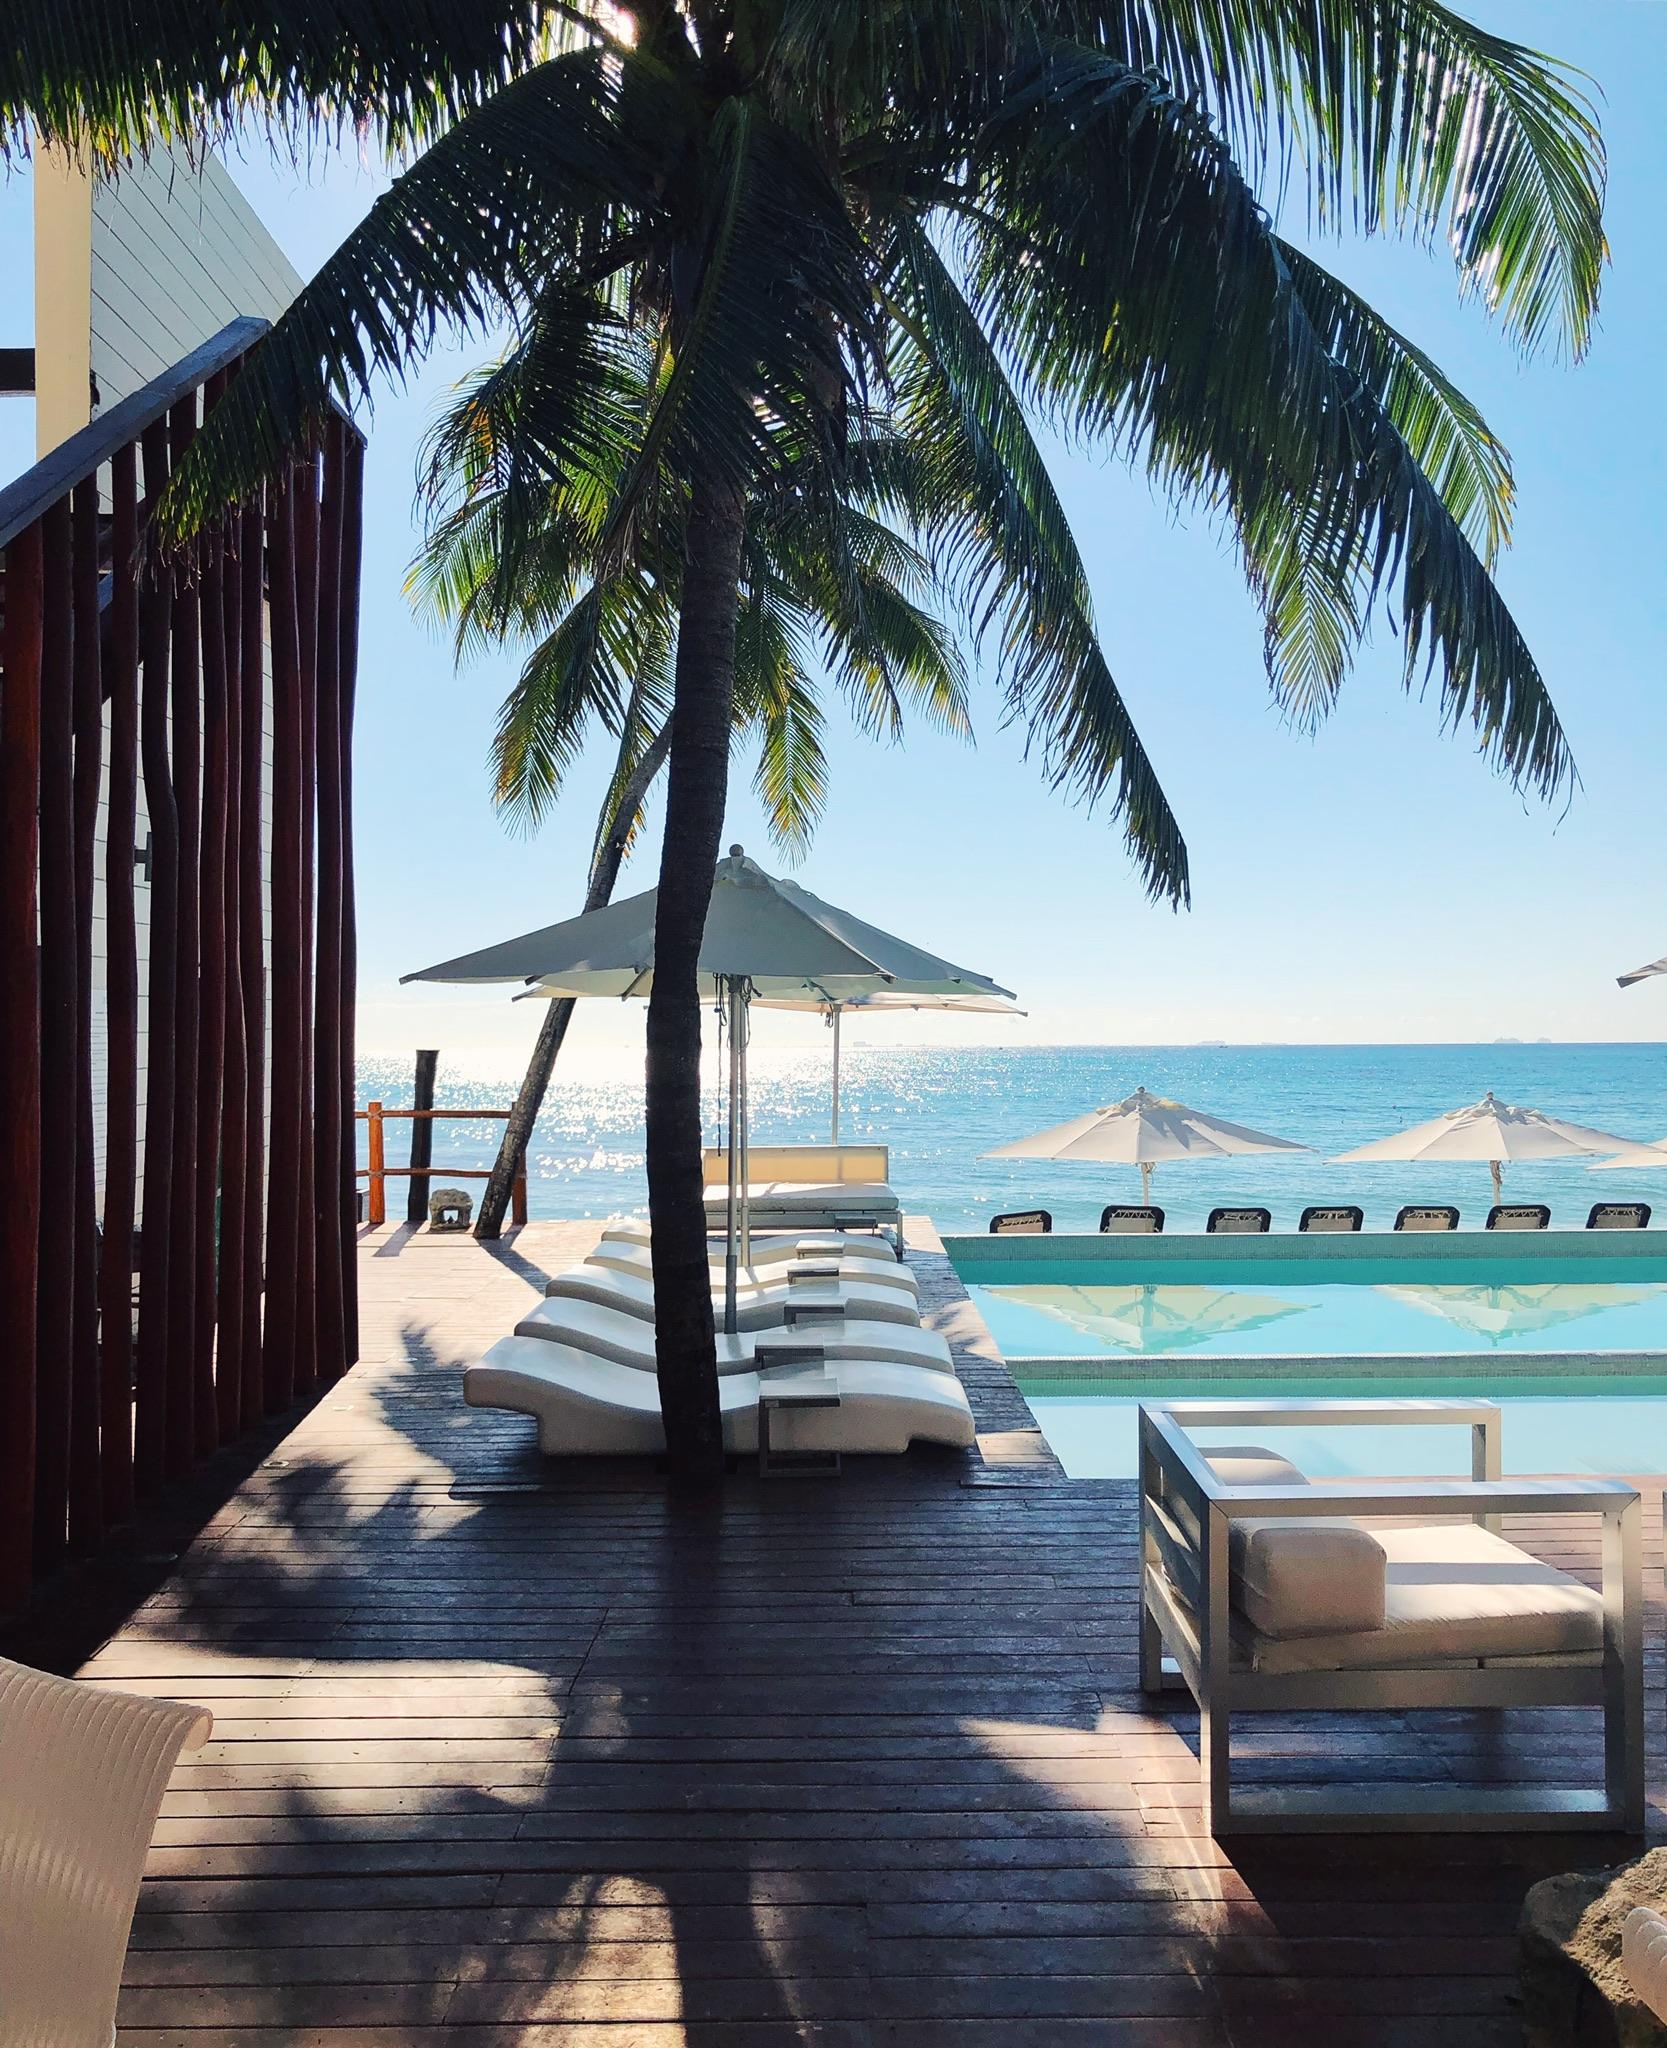 surprise travel. vacation to beach destination. trip to resort.